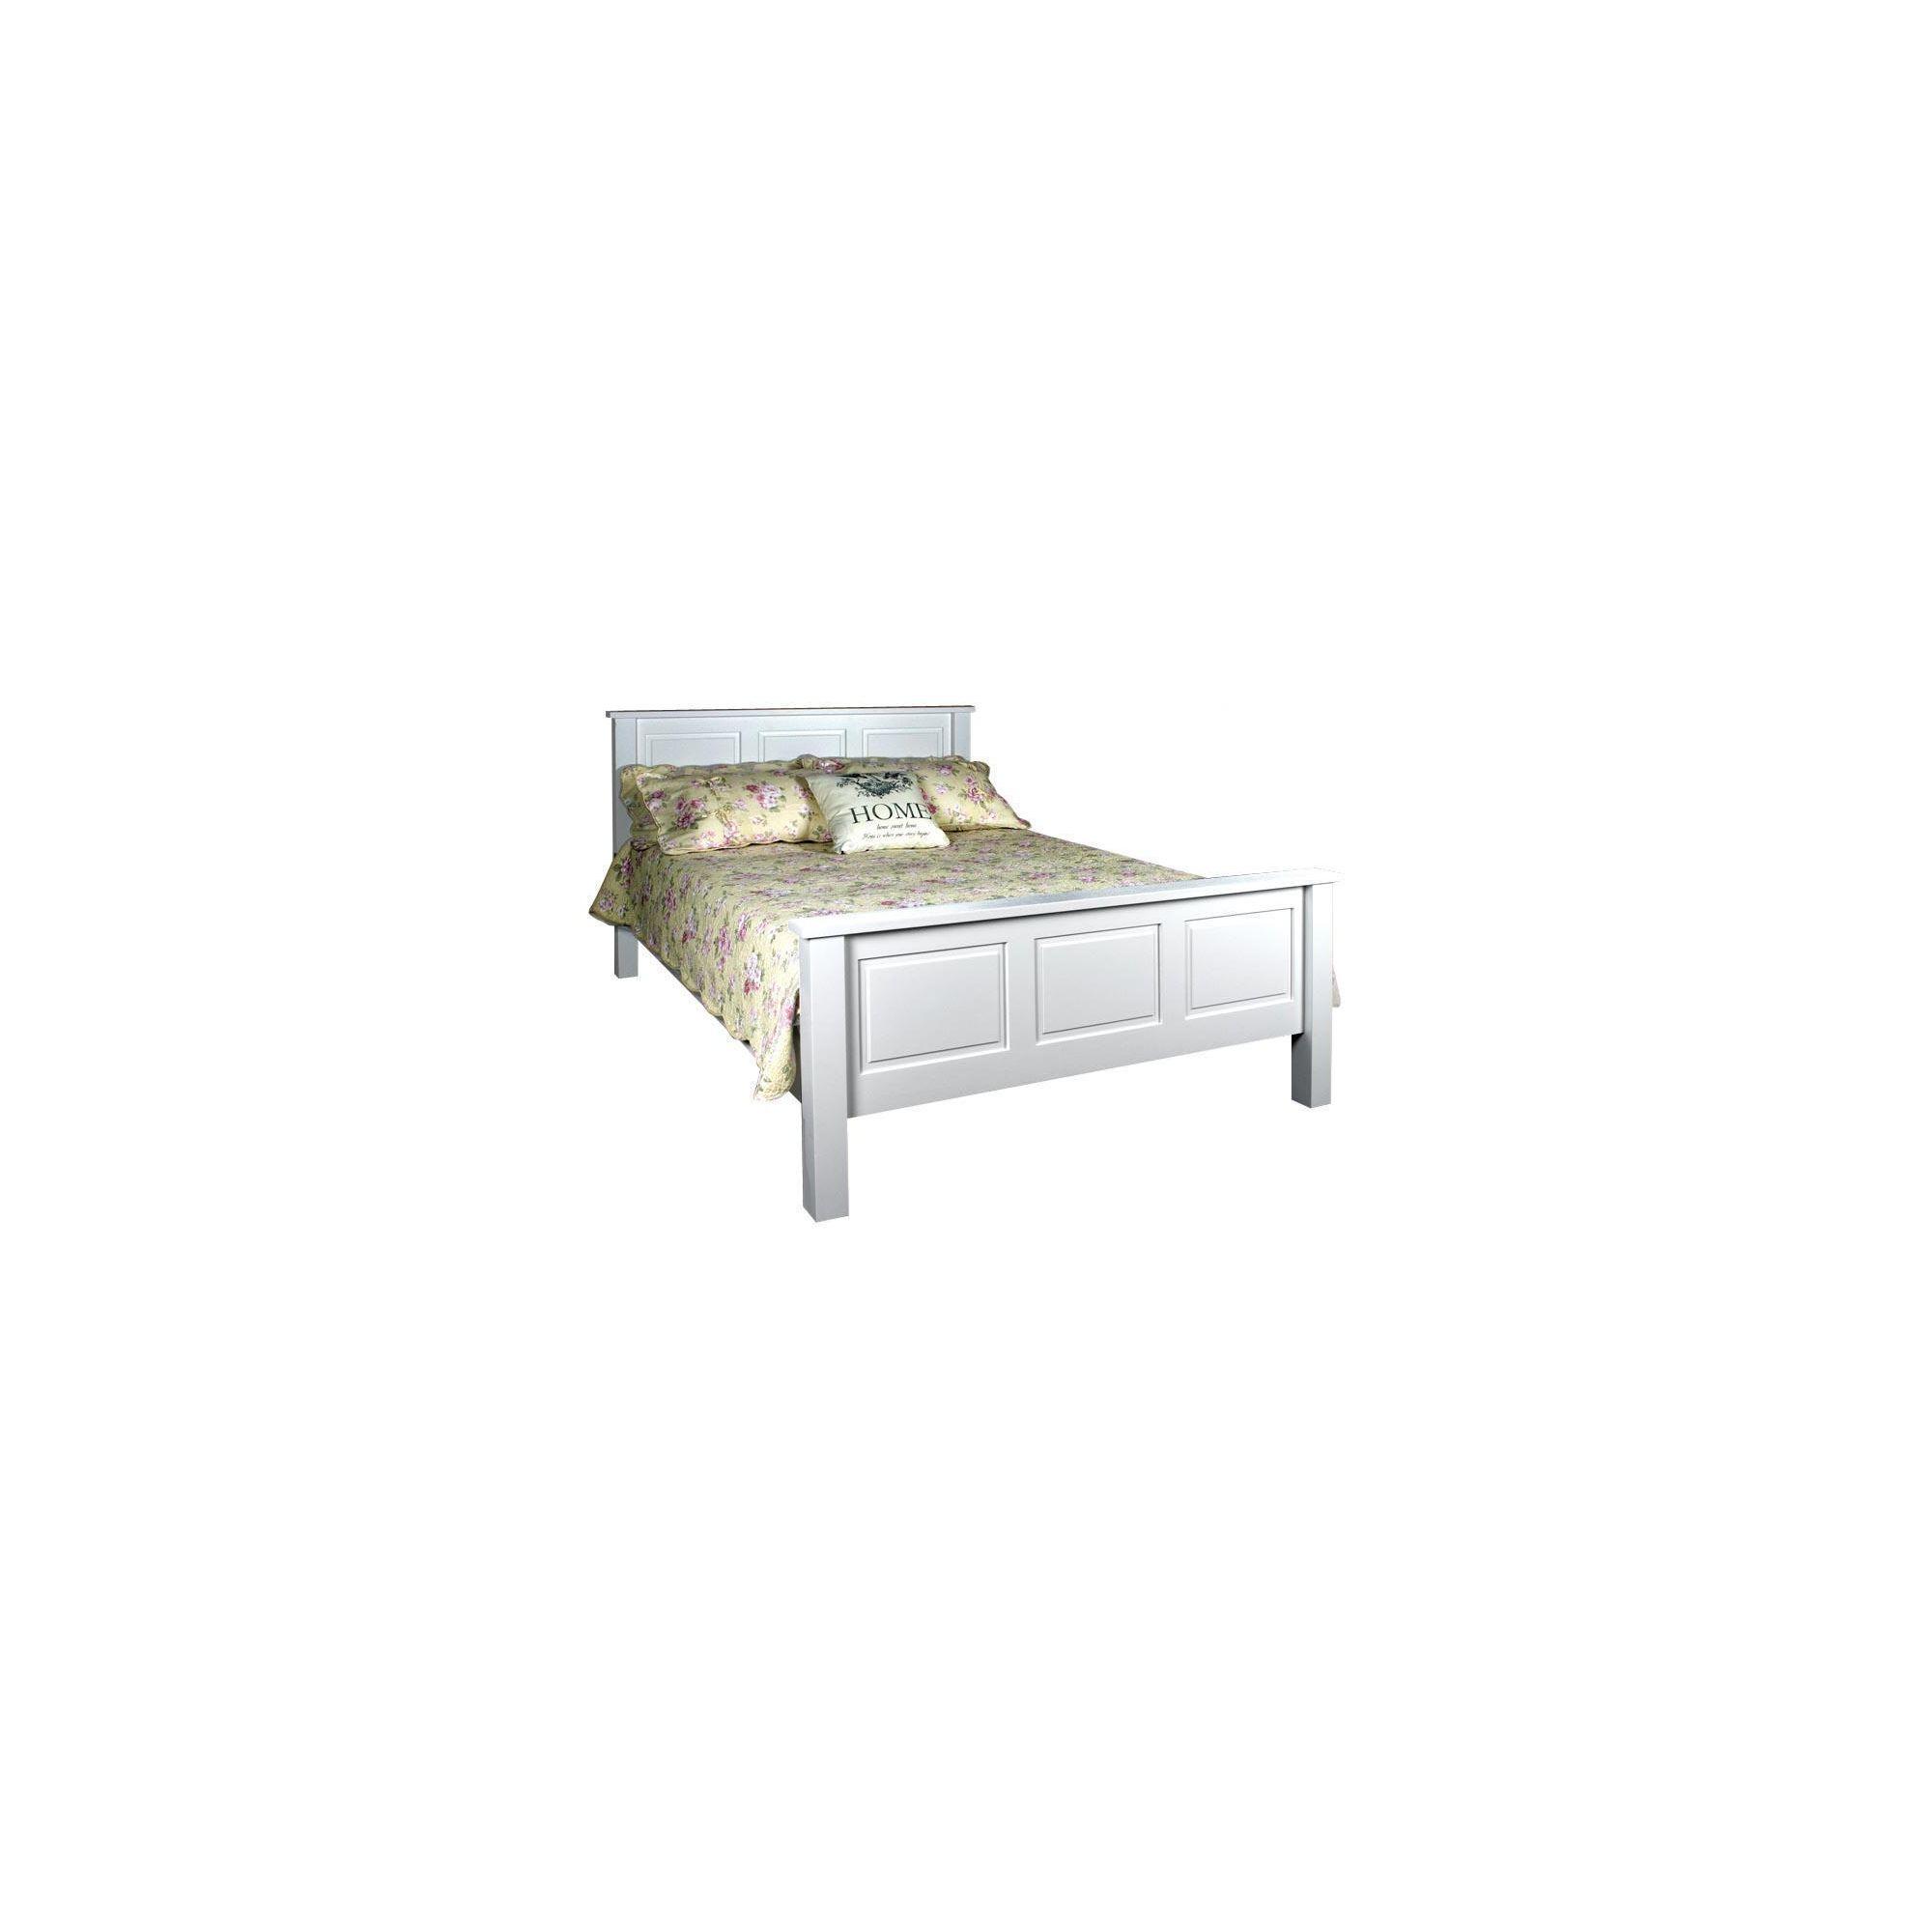 Alterton Furniture Breton Double Bed at Tesco Direct